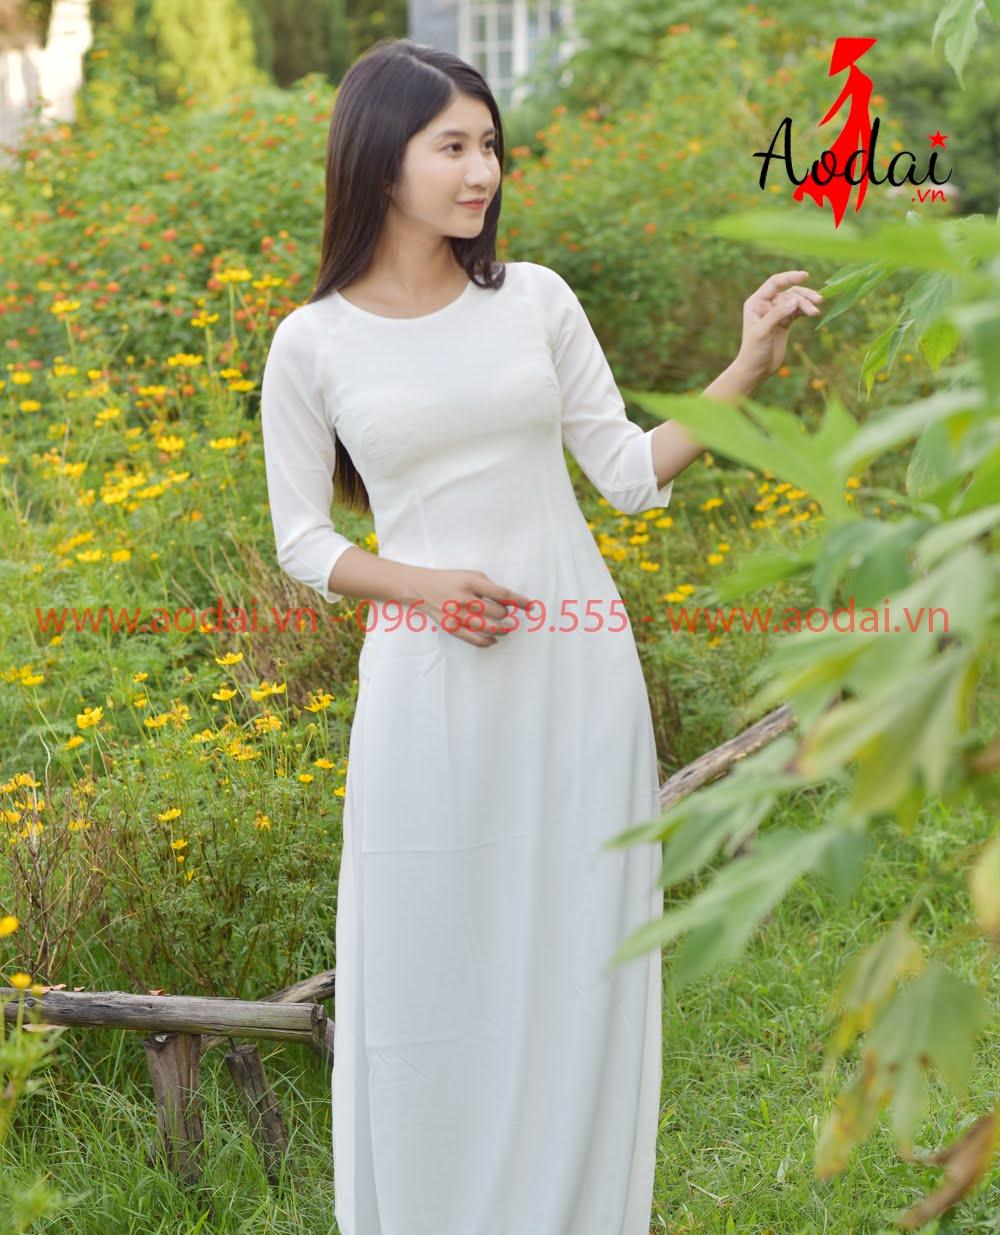 In áo dài tại Sơn La